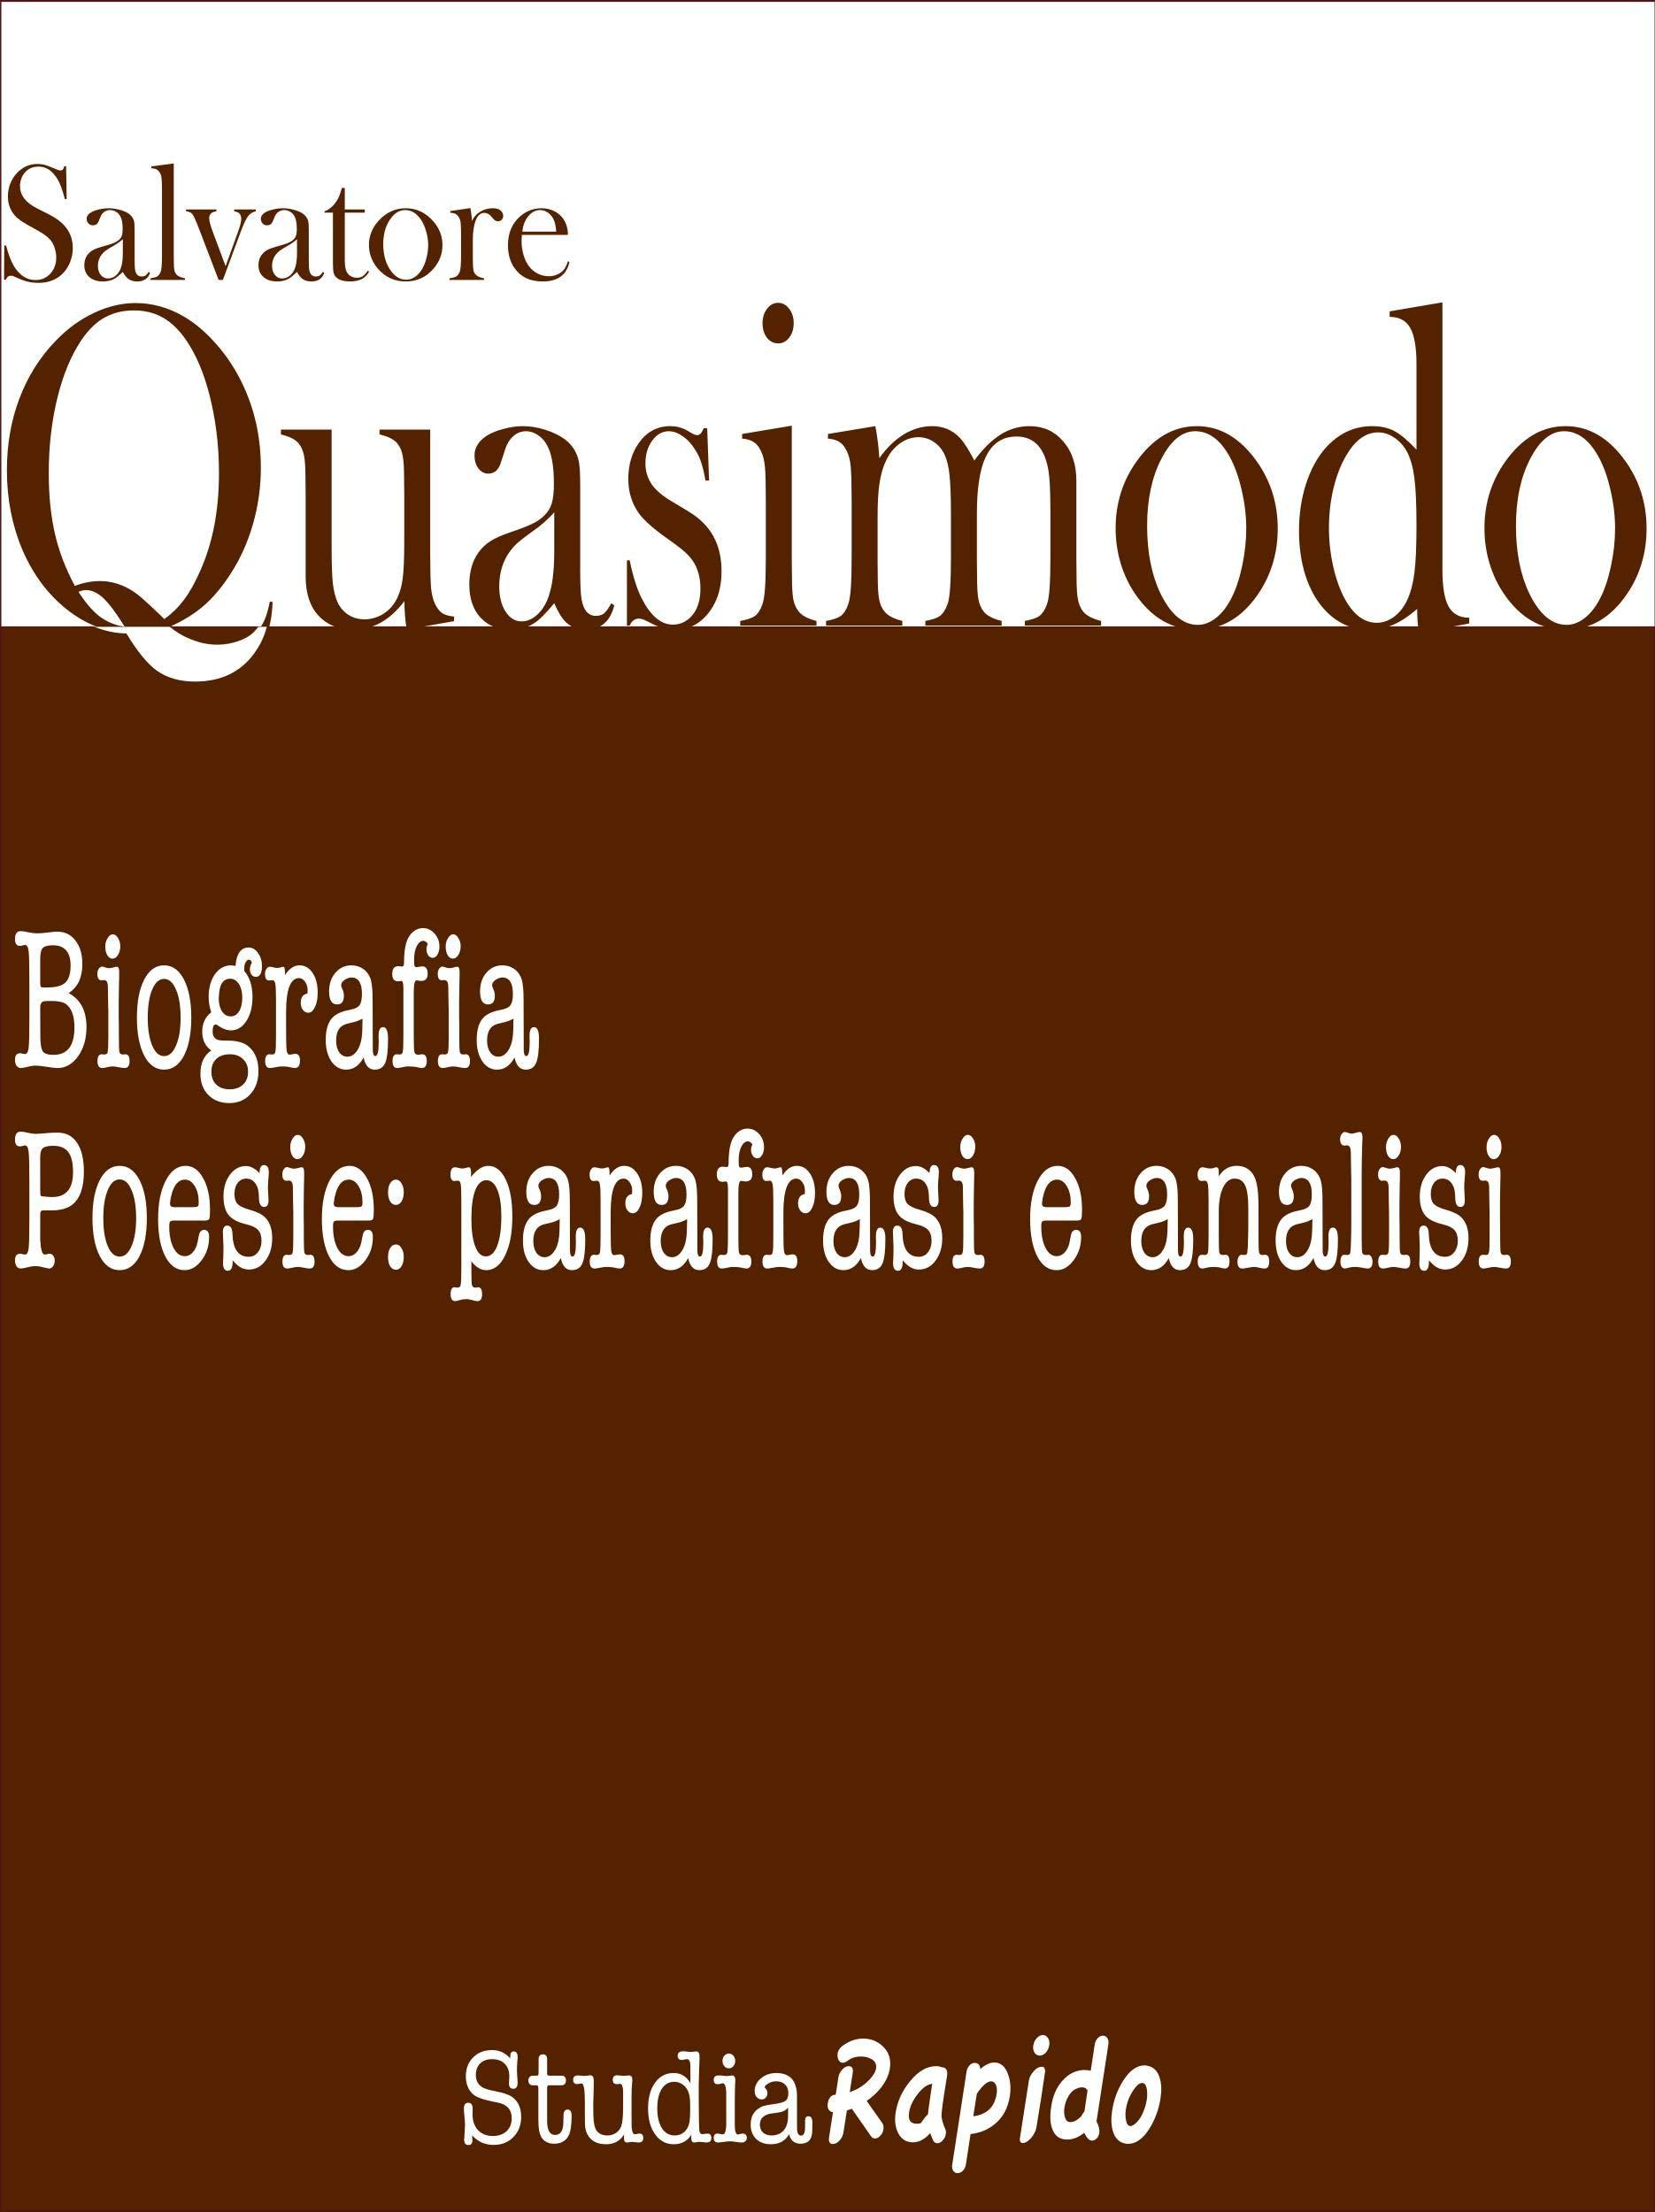 Salvatore Quasimodo. Biografia Poesie  Parafrasi E Analisi  Italian Edition